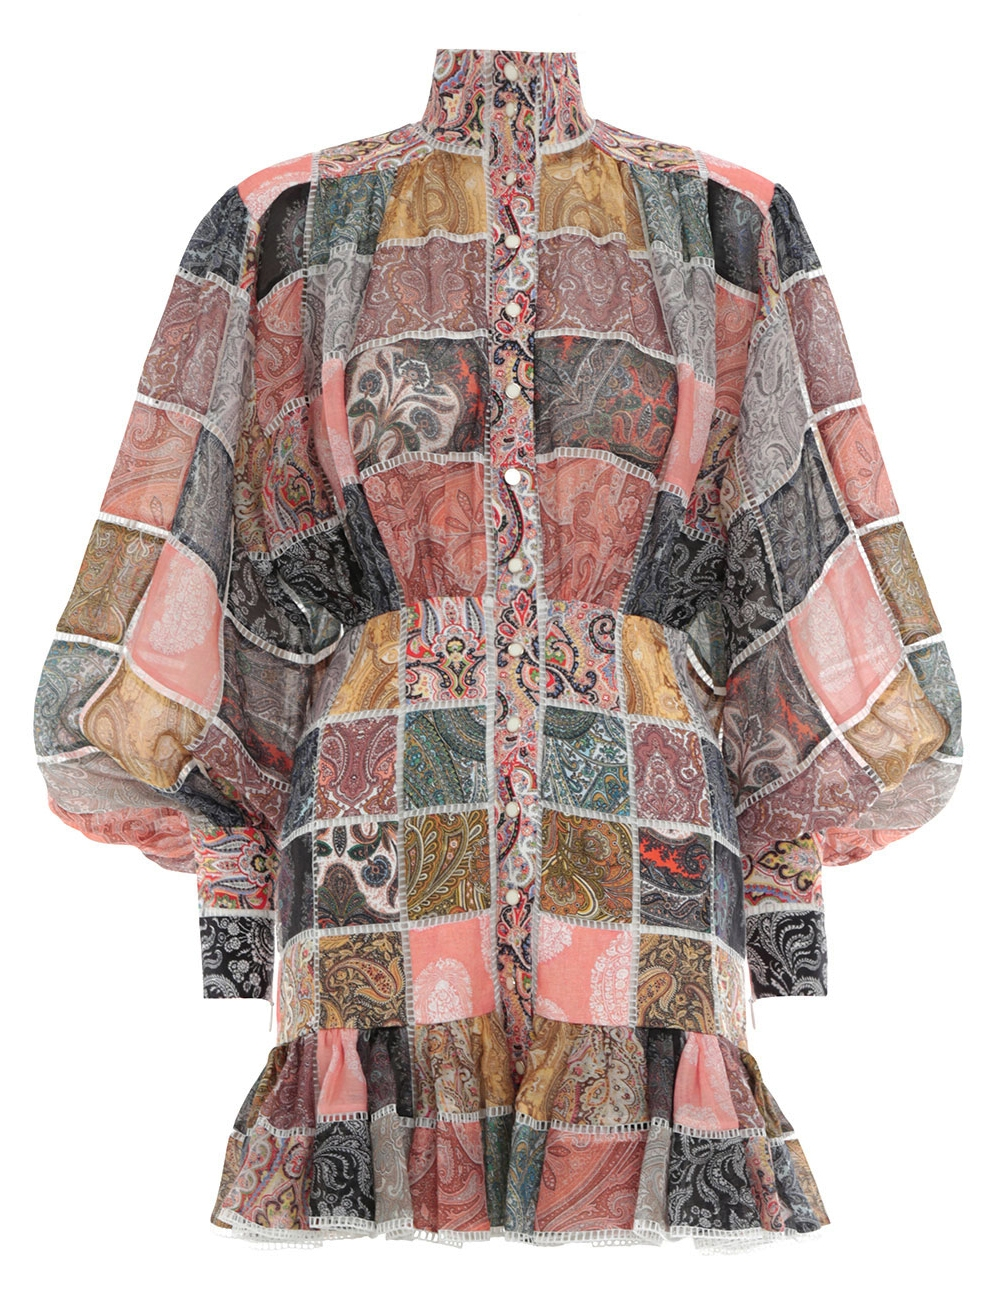 5e74c459d0ec 1.5629dnin.patch.patchwork_paisley-ninety-six-patch-mini-dress -flat.jpg?width=500&height=645&canvas=500:645&quality=100&bg-color=255,255,255&fit=bounds